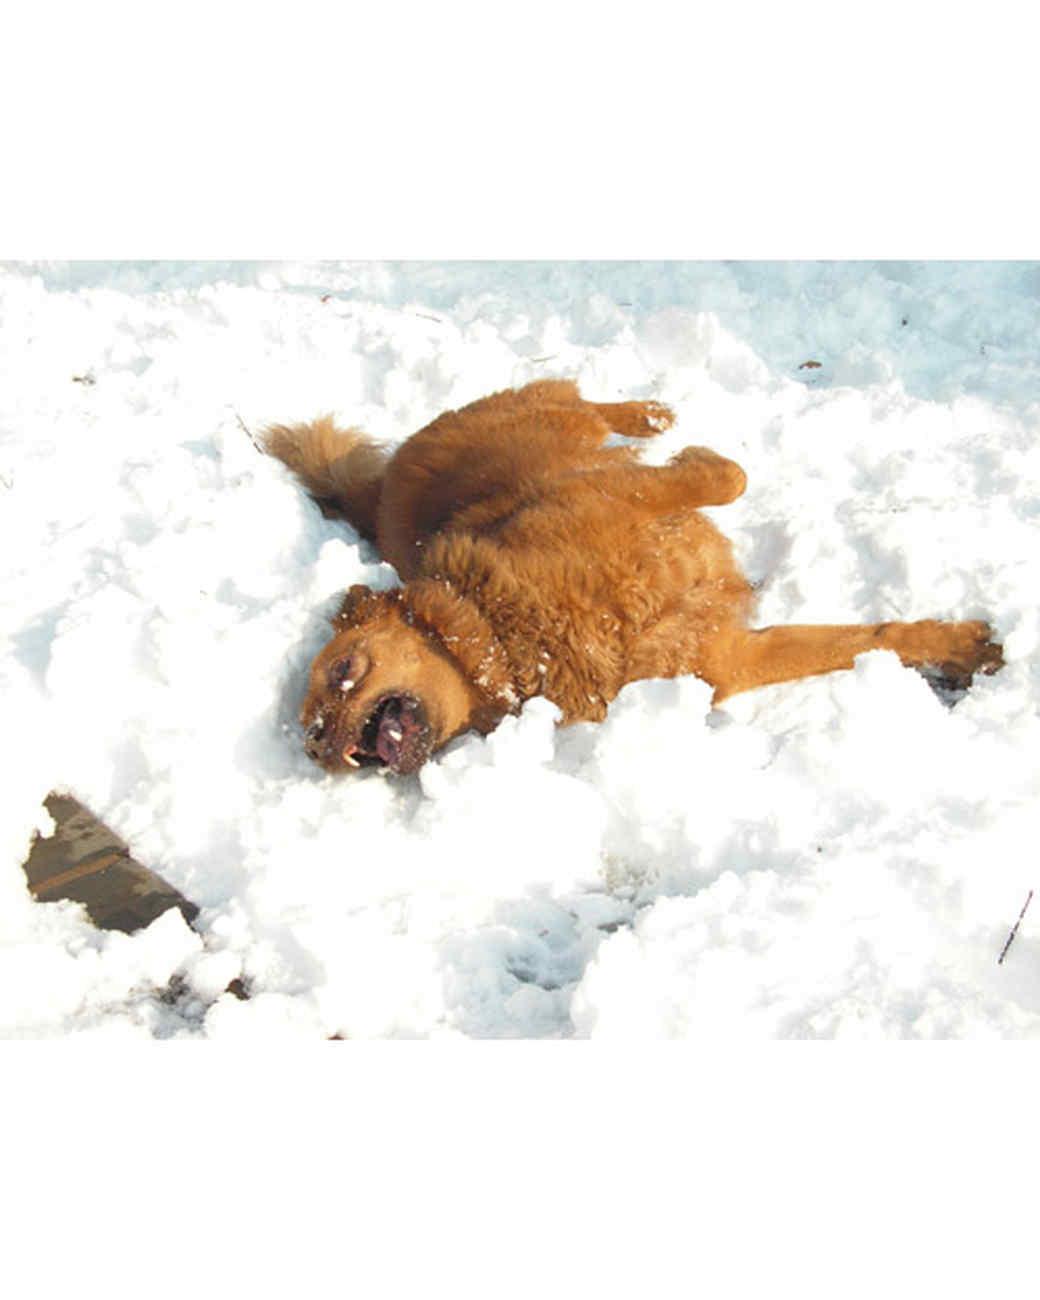 pets_snowangels_7080225_122717_18557809.jpg